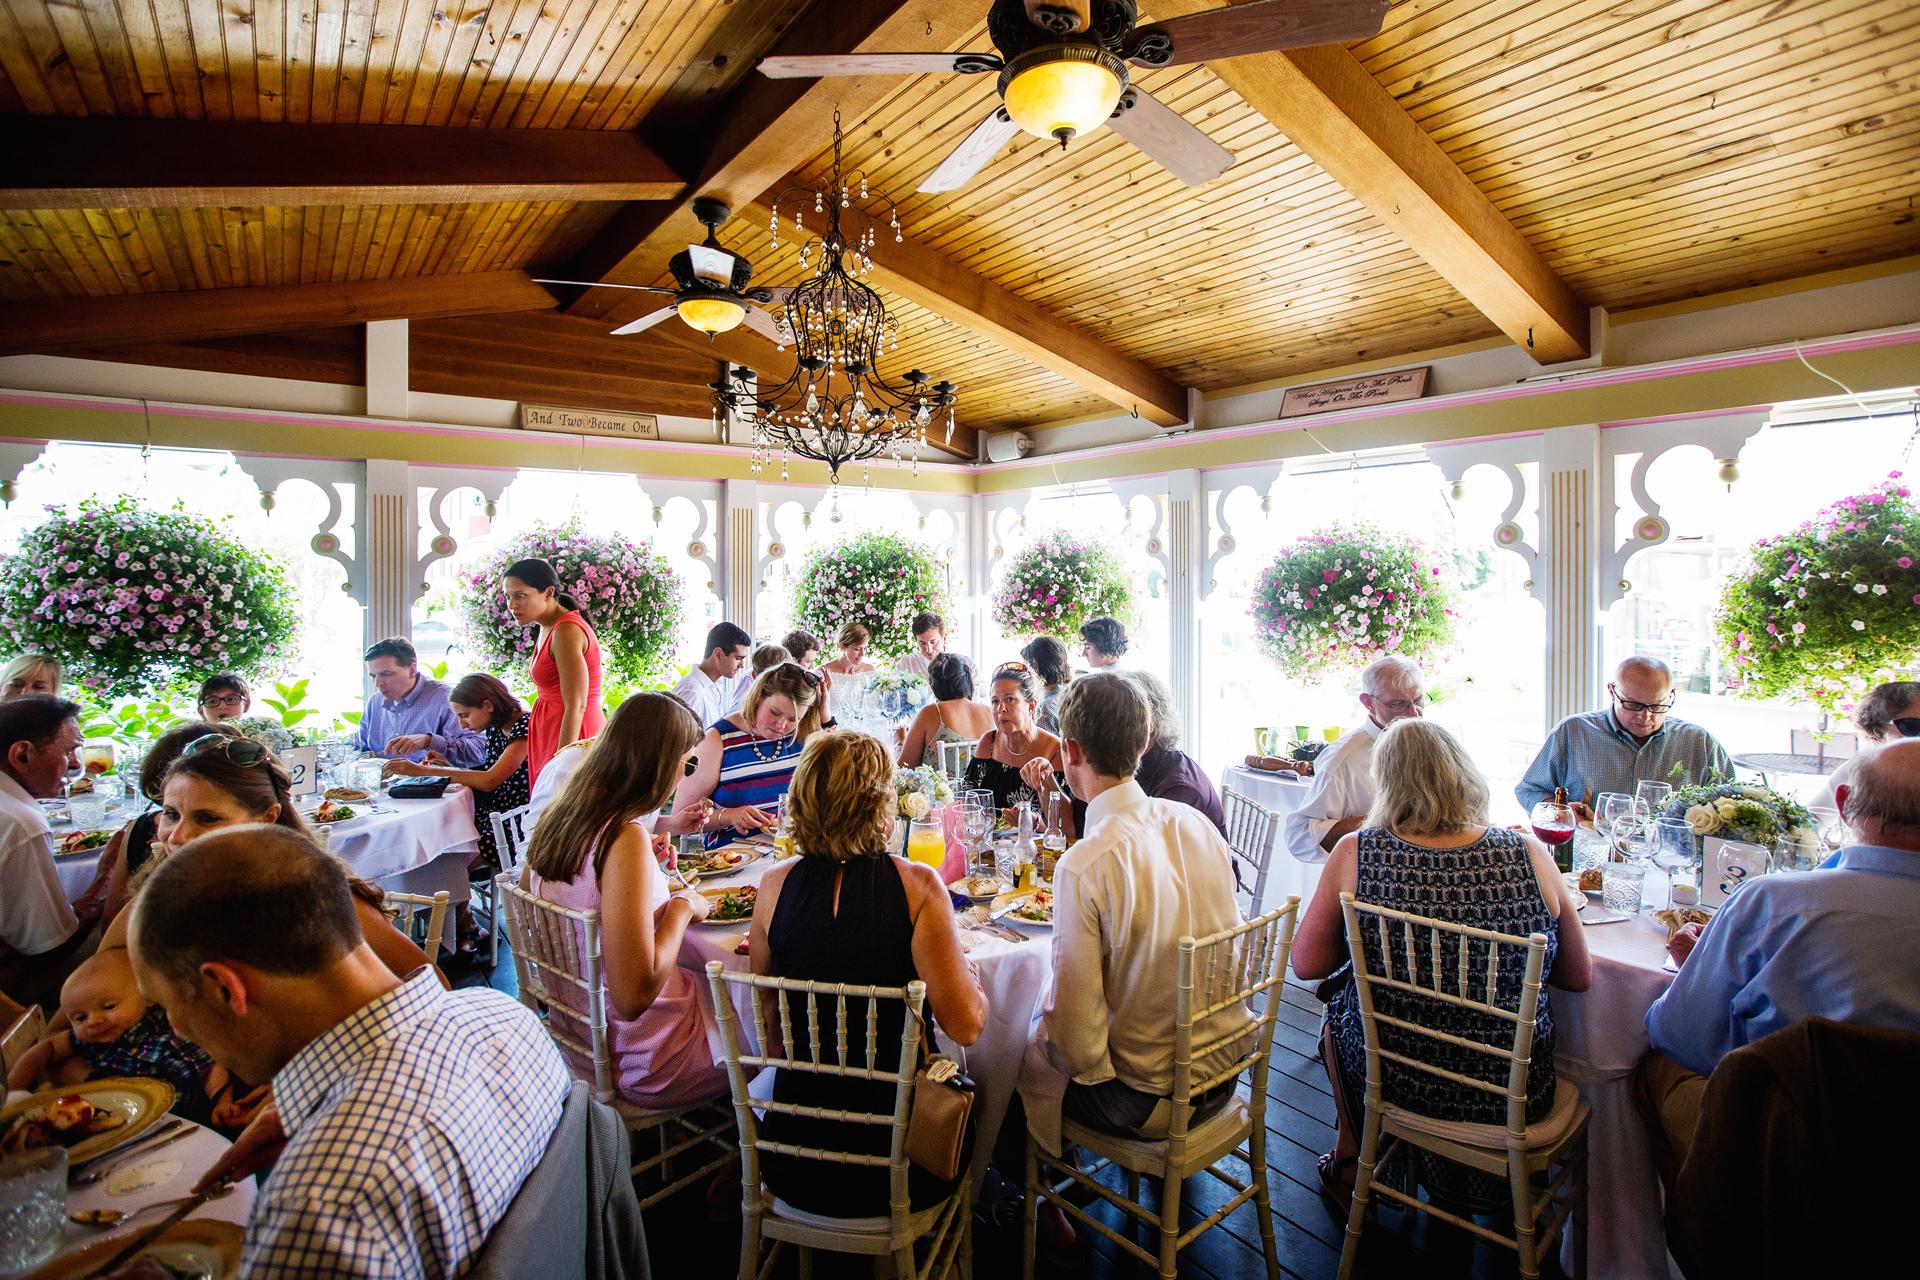 LBI Elopement Reception Reception Venue Images | Guests enjoy al fresco dining on the beautiful porch